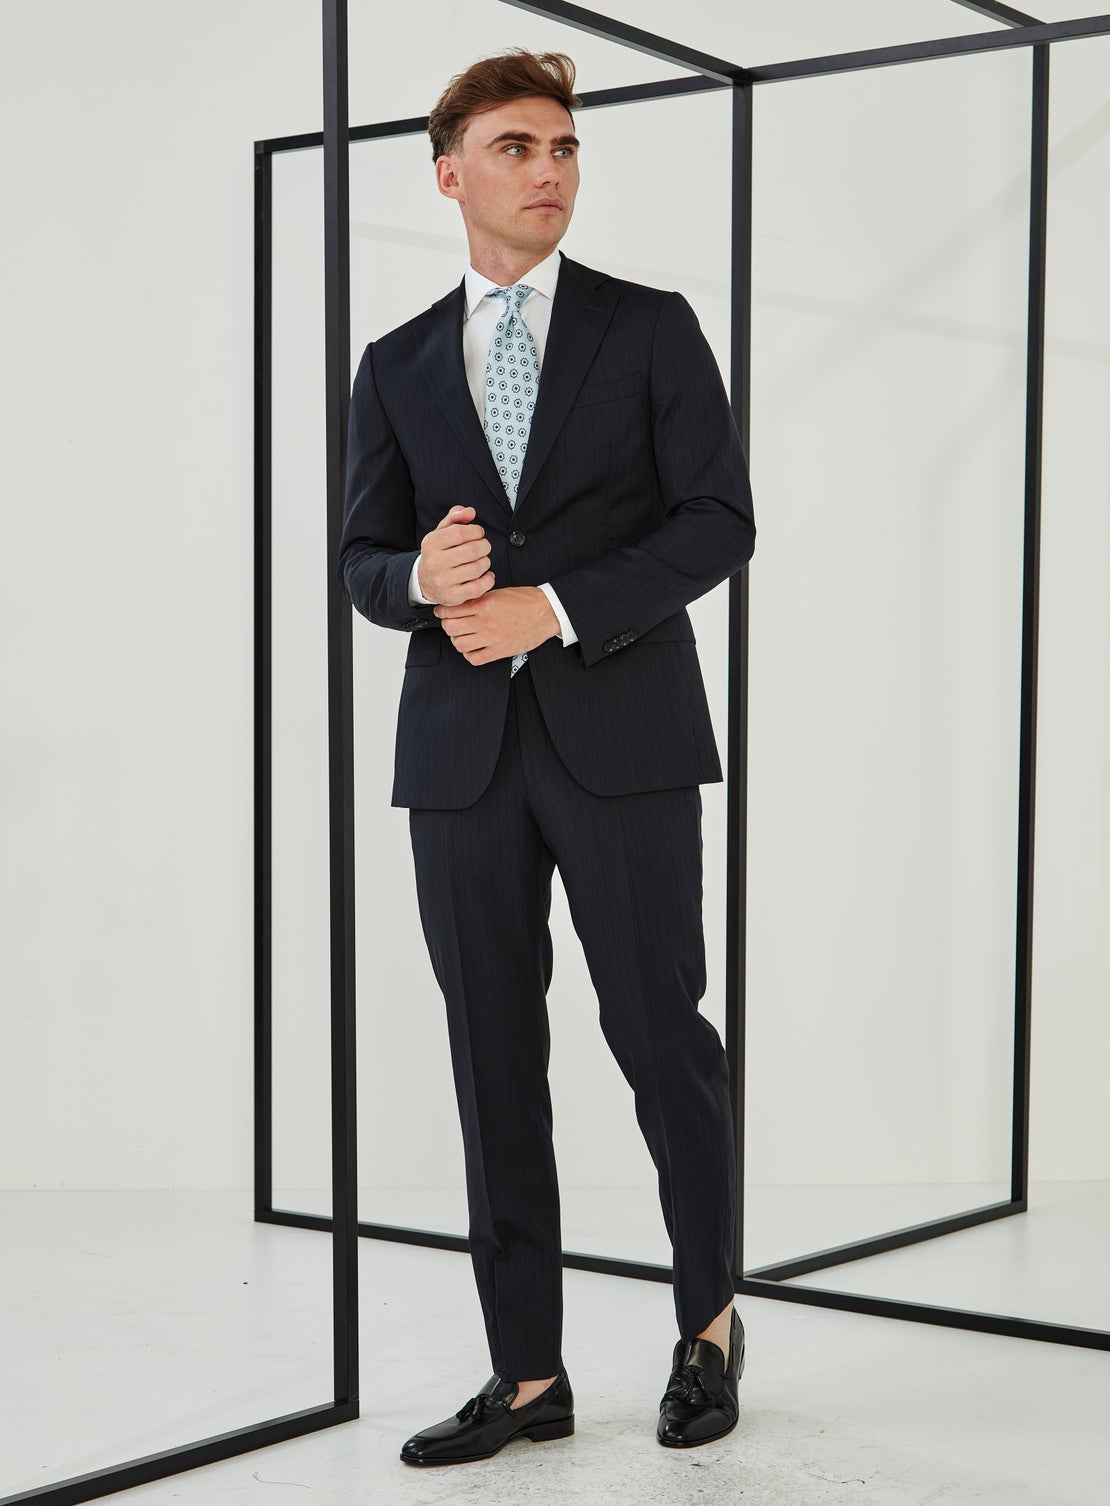 Bjorn Navy Shadow Stripe Suit